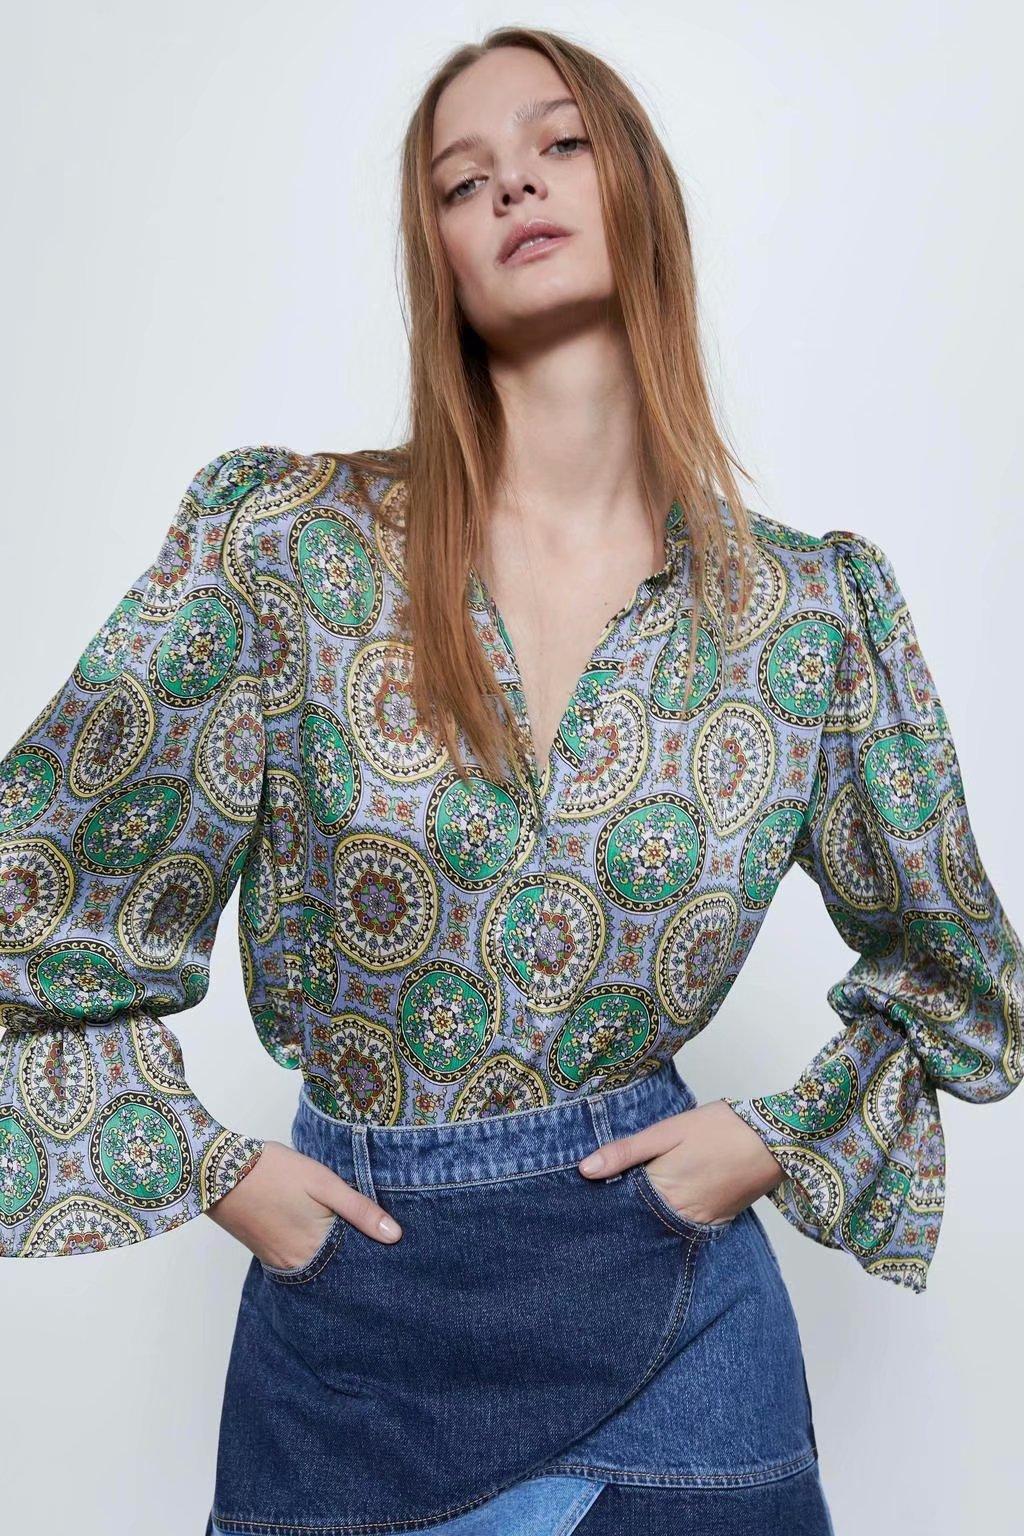 2020 New Spring Summer European Streetwear Printed Flowing Female Shirt Zaraing Vadiming Sheining Women's Printed Shirt A9658